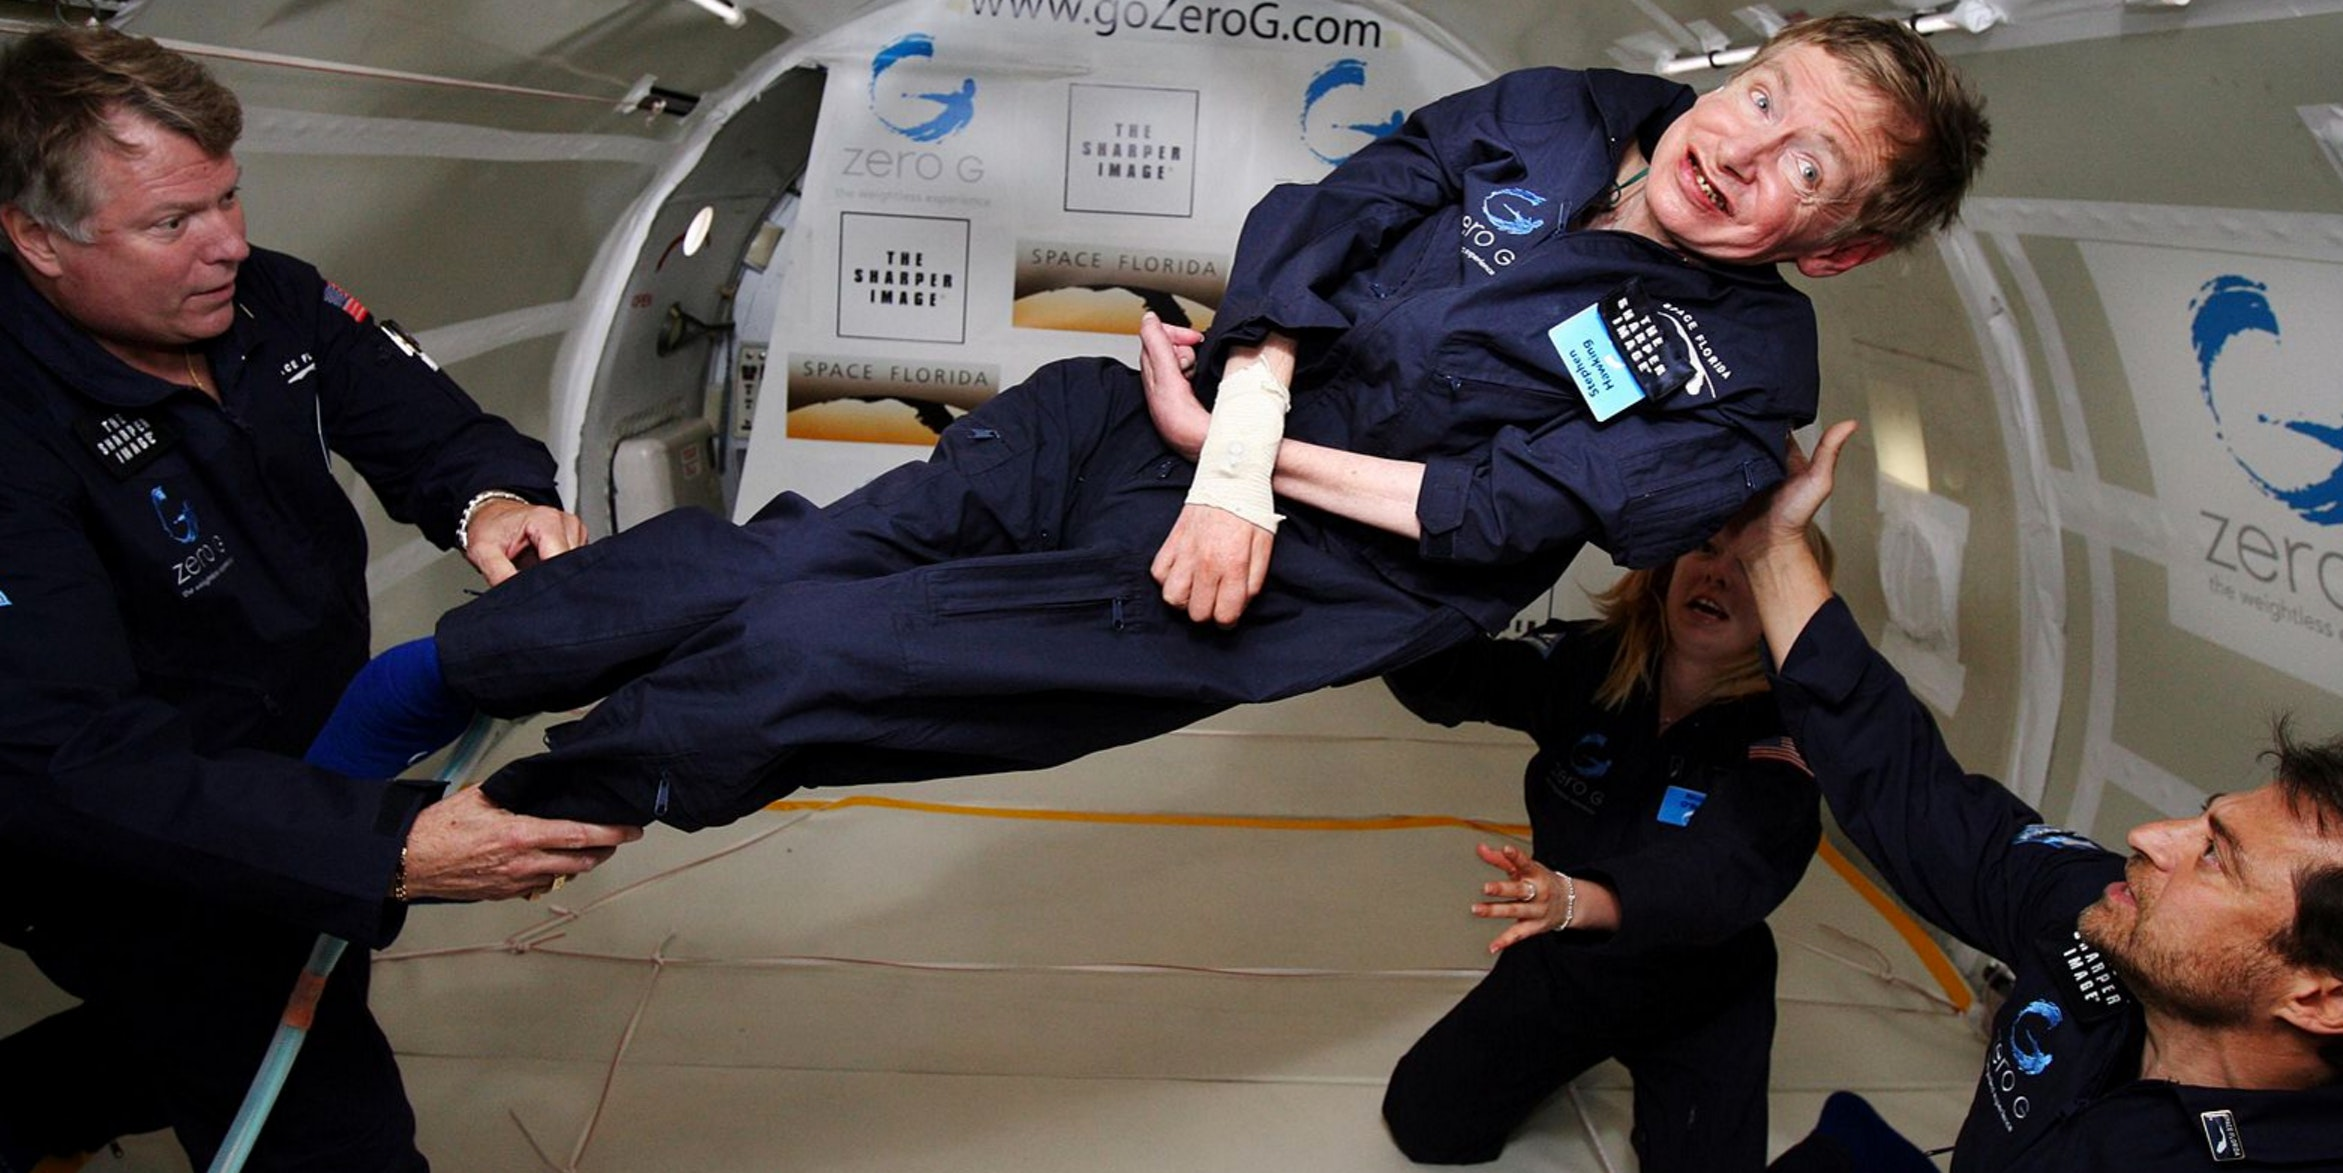 Physicist Stephen Hawking experiences zero gravity.